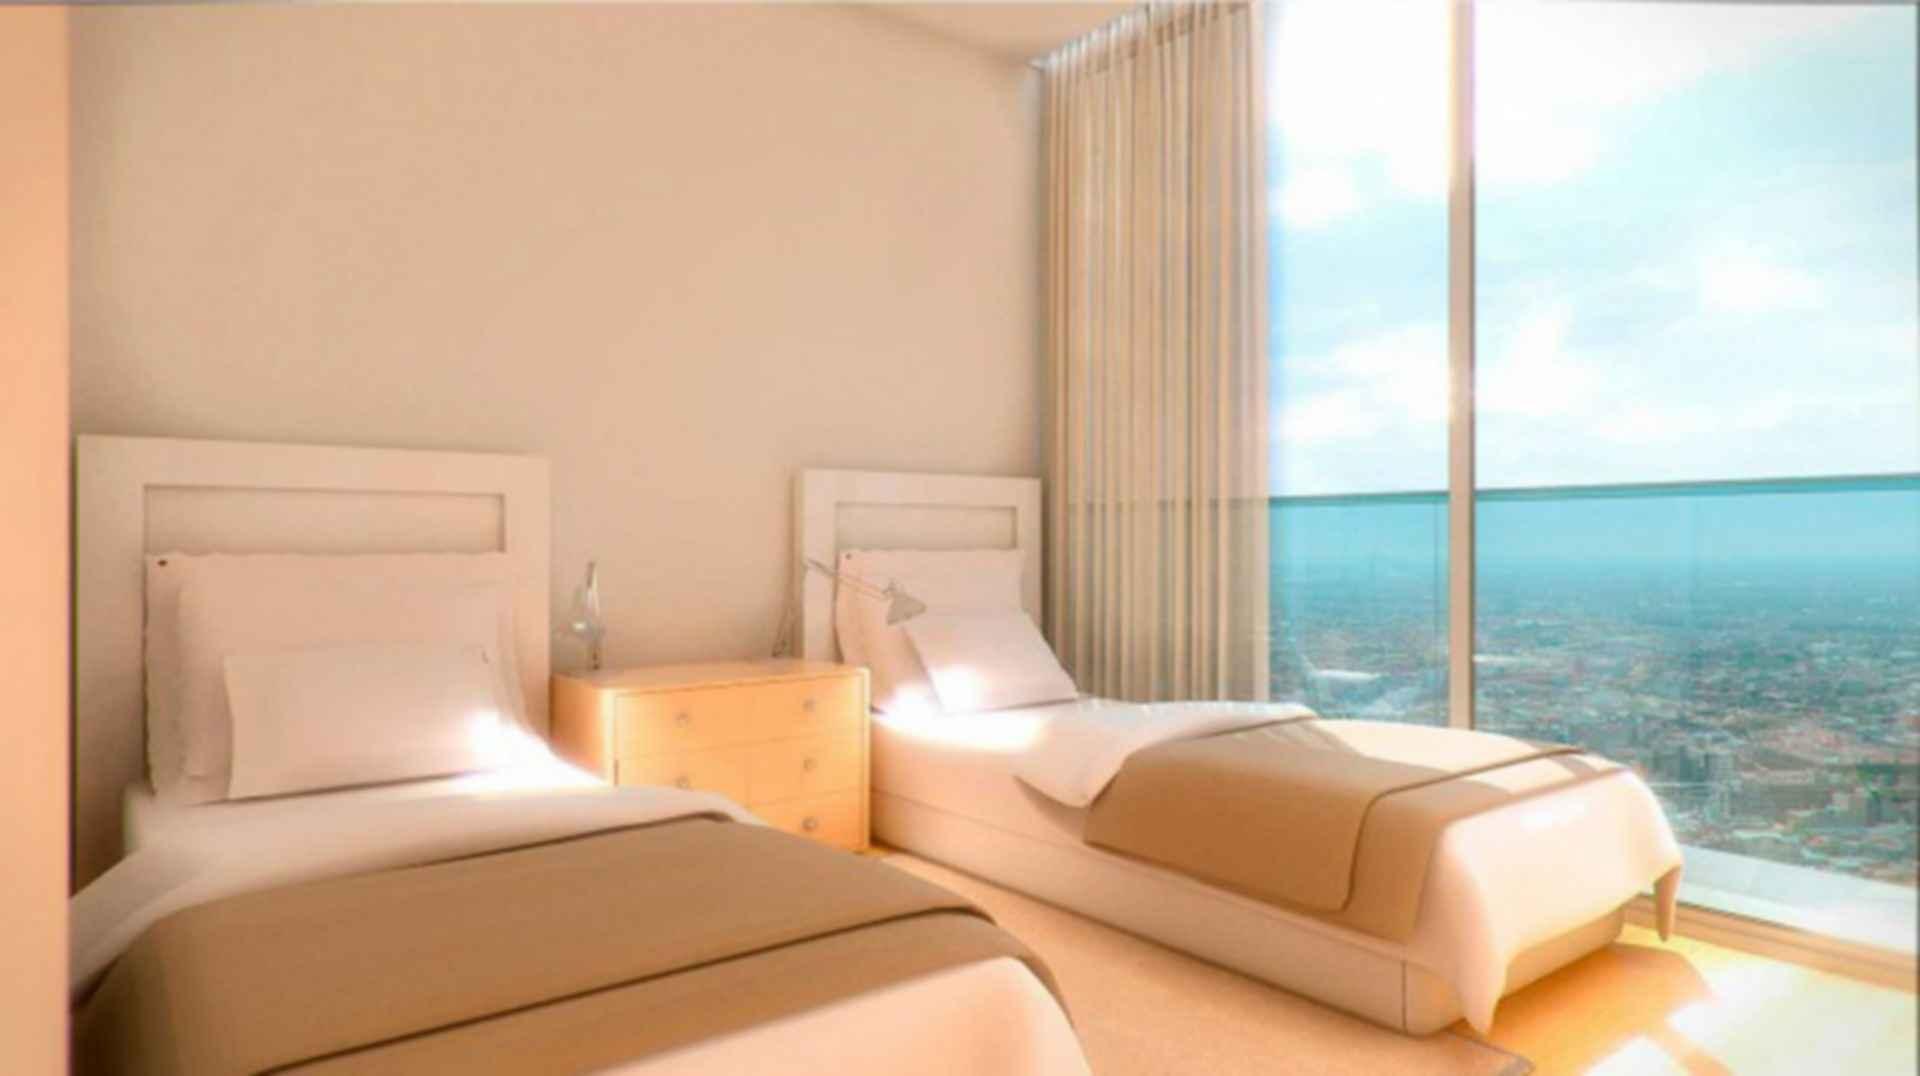 BD Bacata Tower - Concept Design/Interior/Bedroom